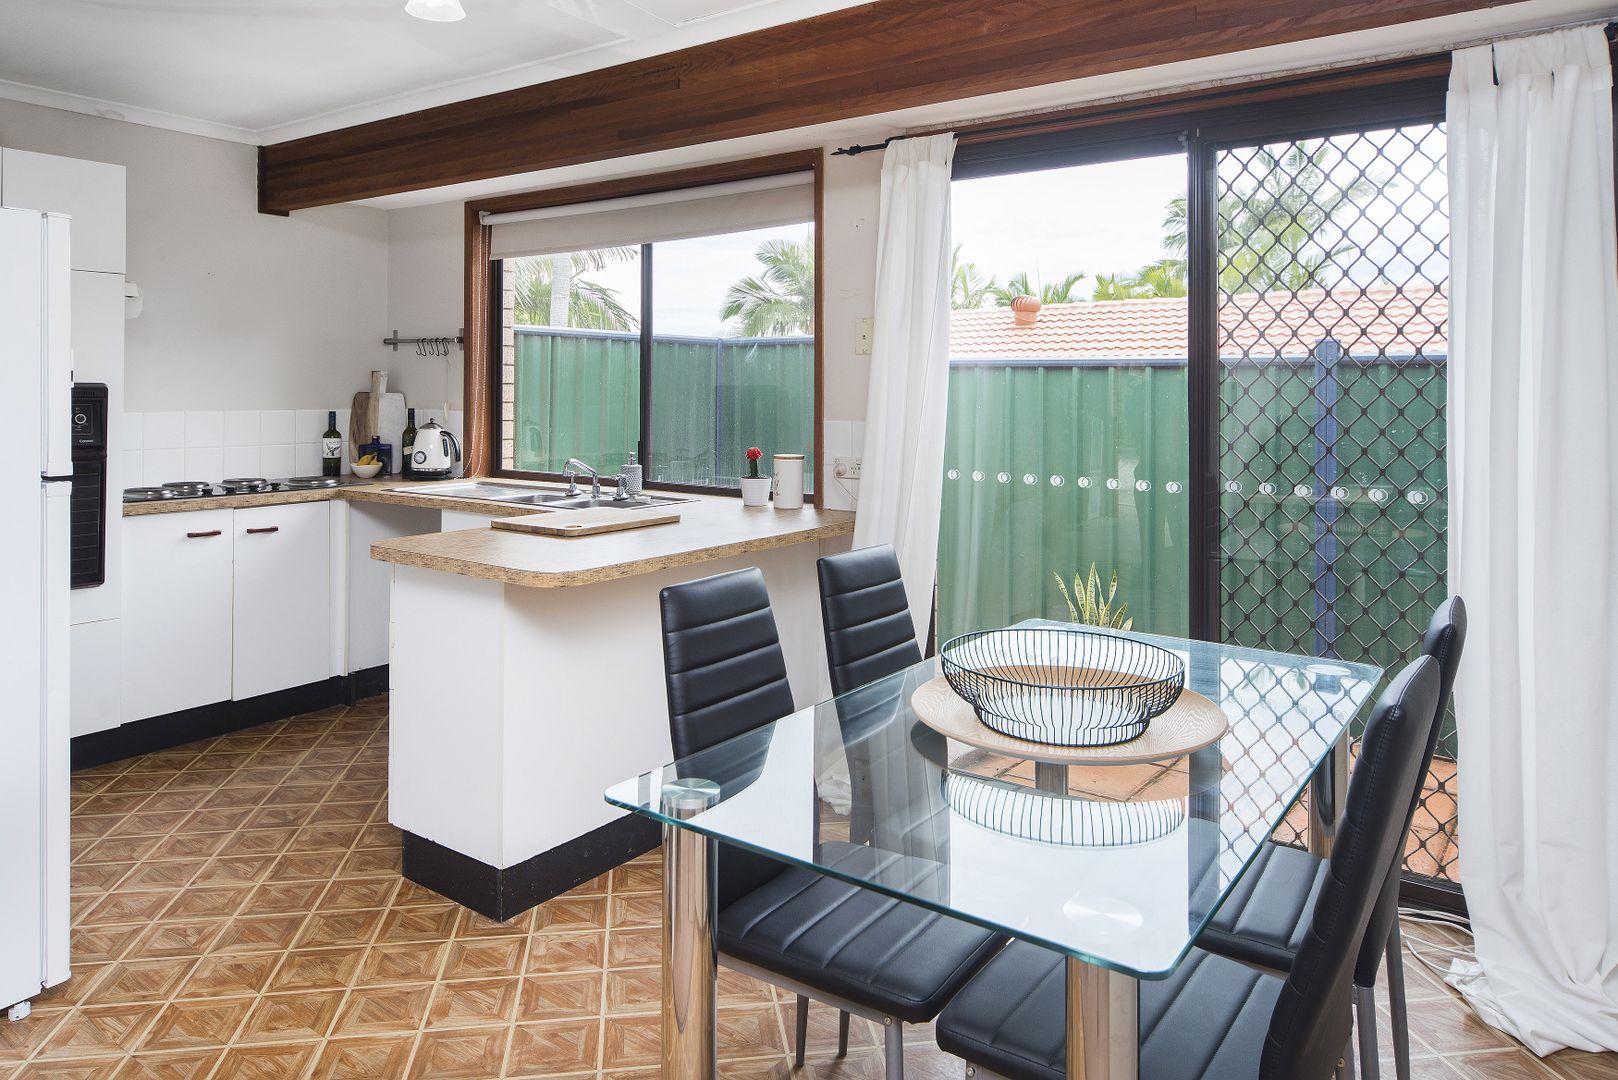 15/13 Cannington Place, Helensvale QLD 4212, Image 2